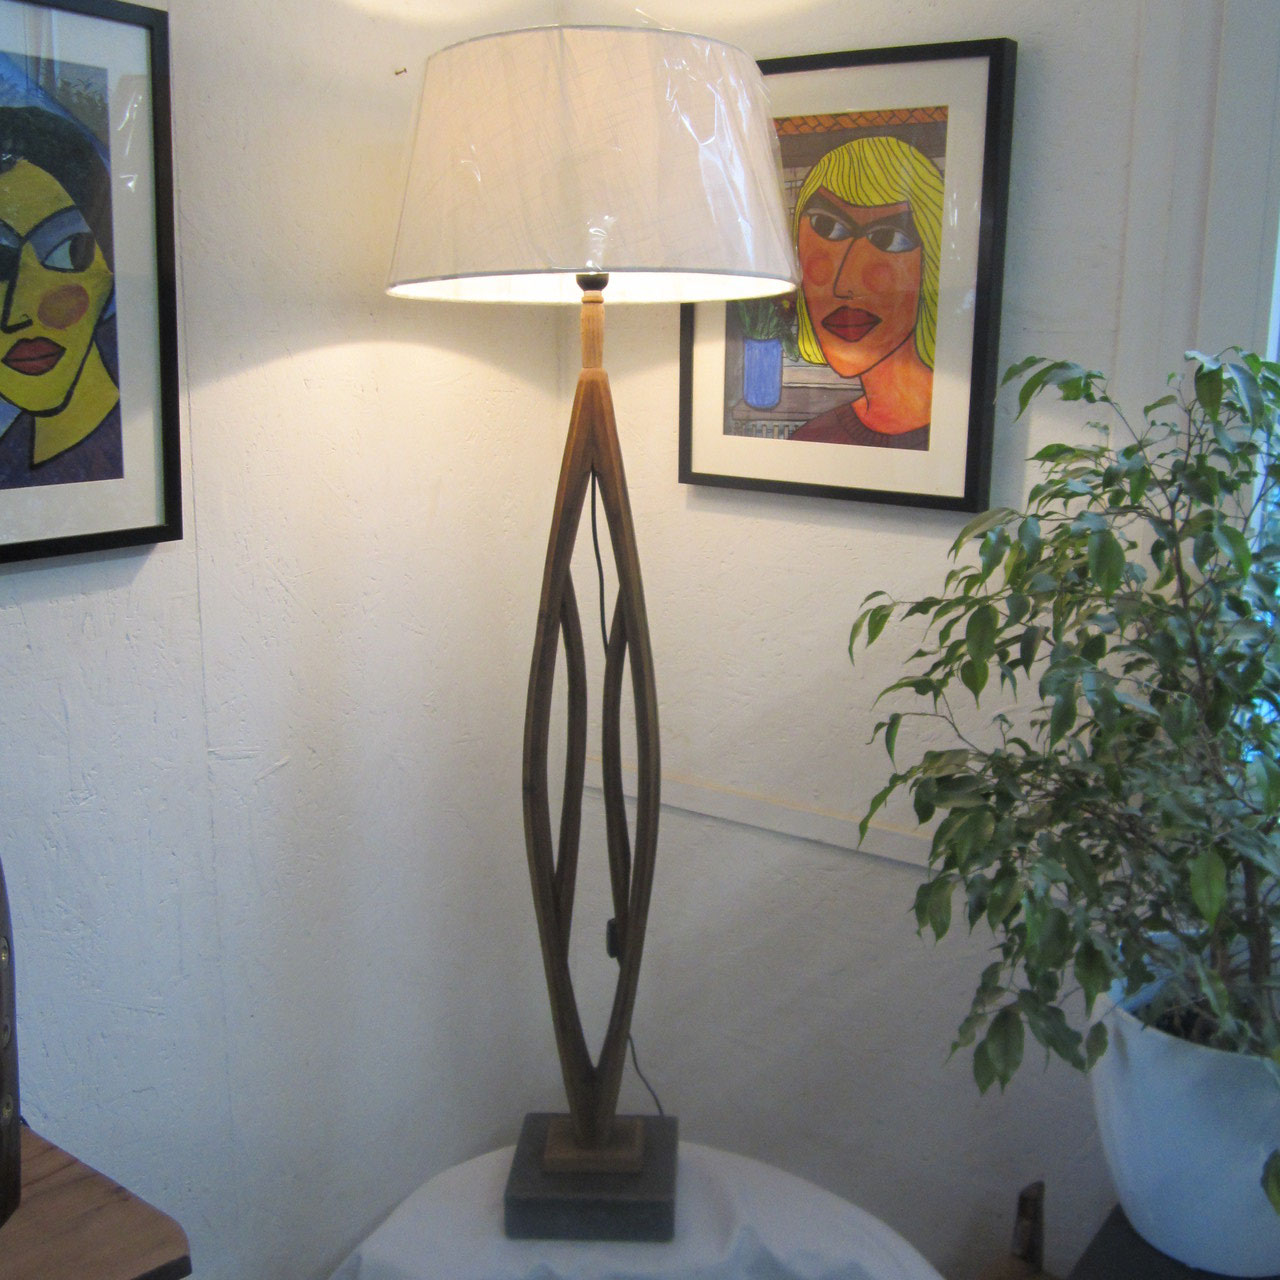 leuchten lampen unikate aus holz stein u metall nach udo 39 s art udo s art kunst aus holz stein. Black Bedroom Furniture Sets. Home Design Ideas